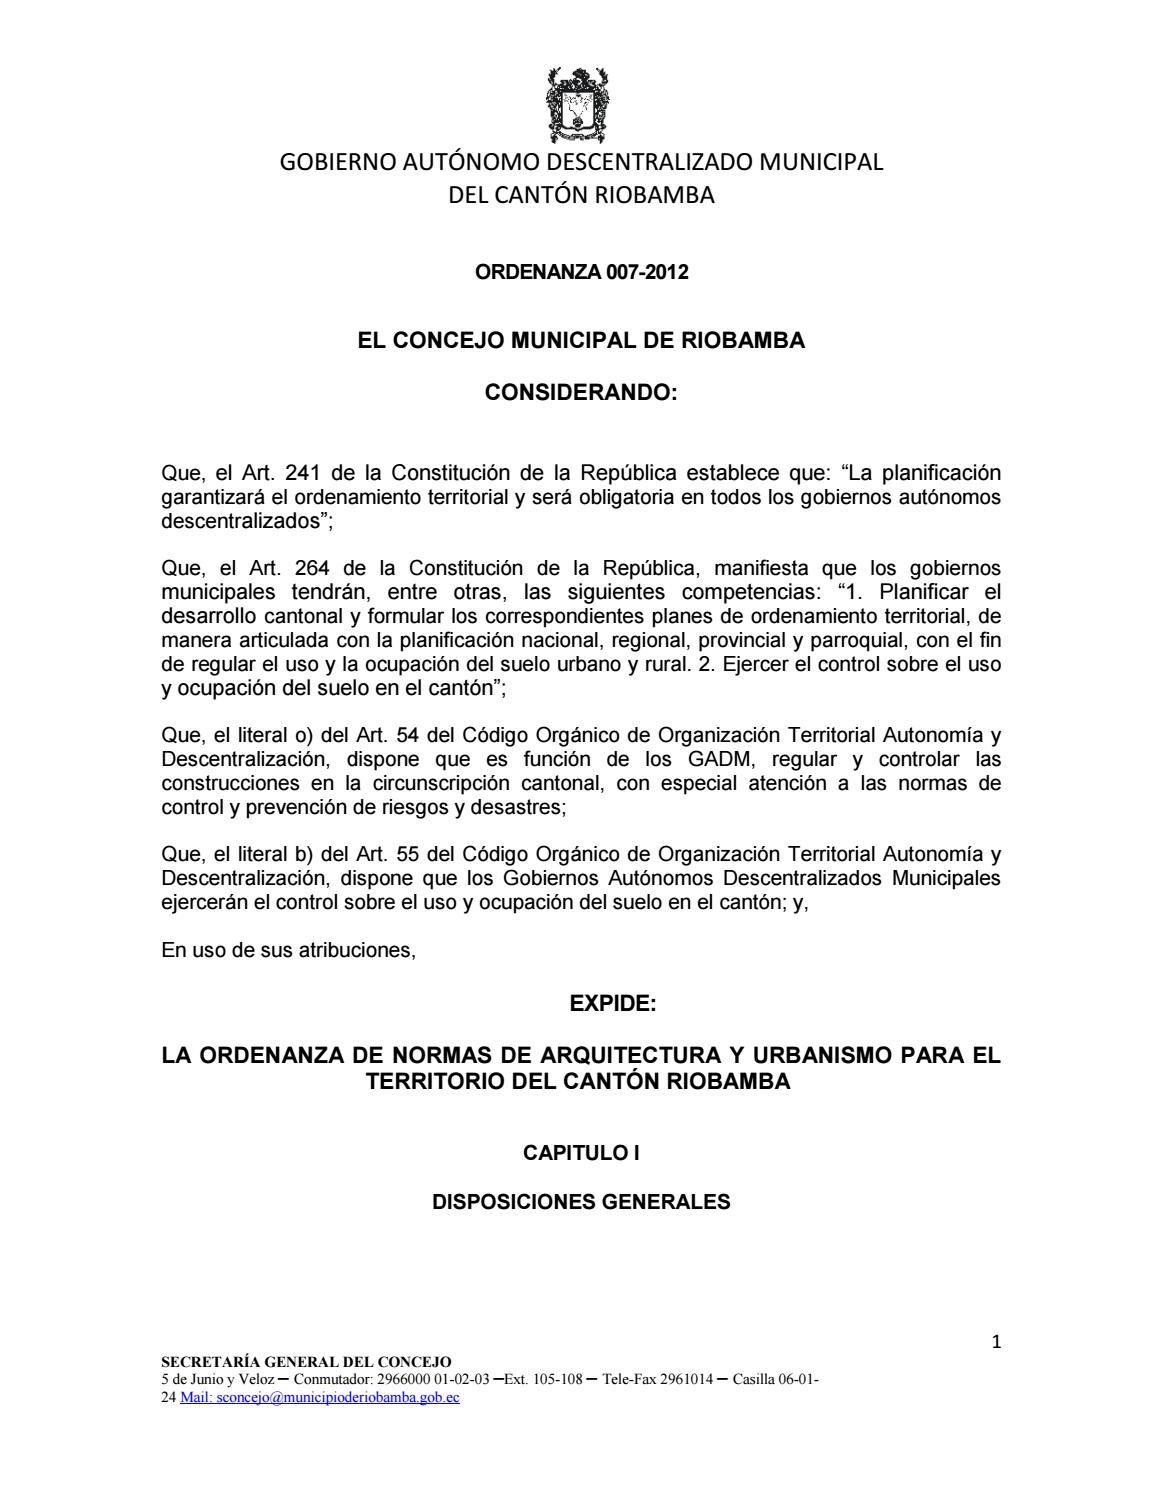 Ordenanza 007 2012 normas de arquitectura (1) by VaneLu Maza - issuu